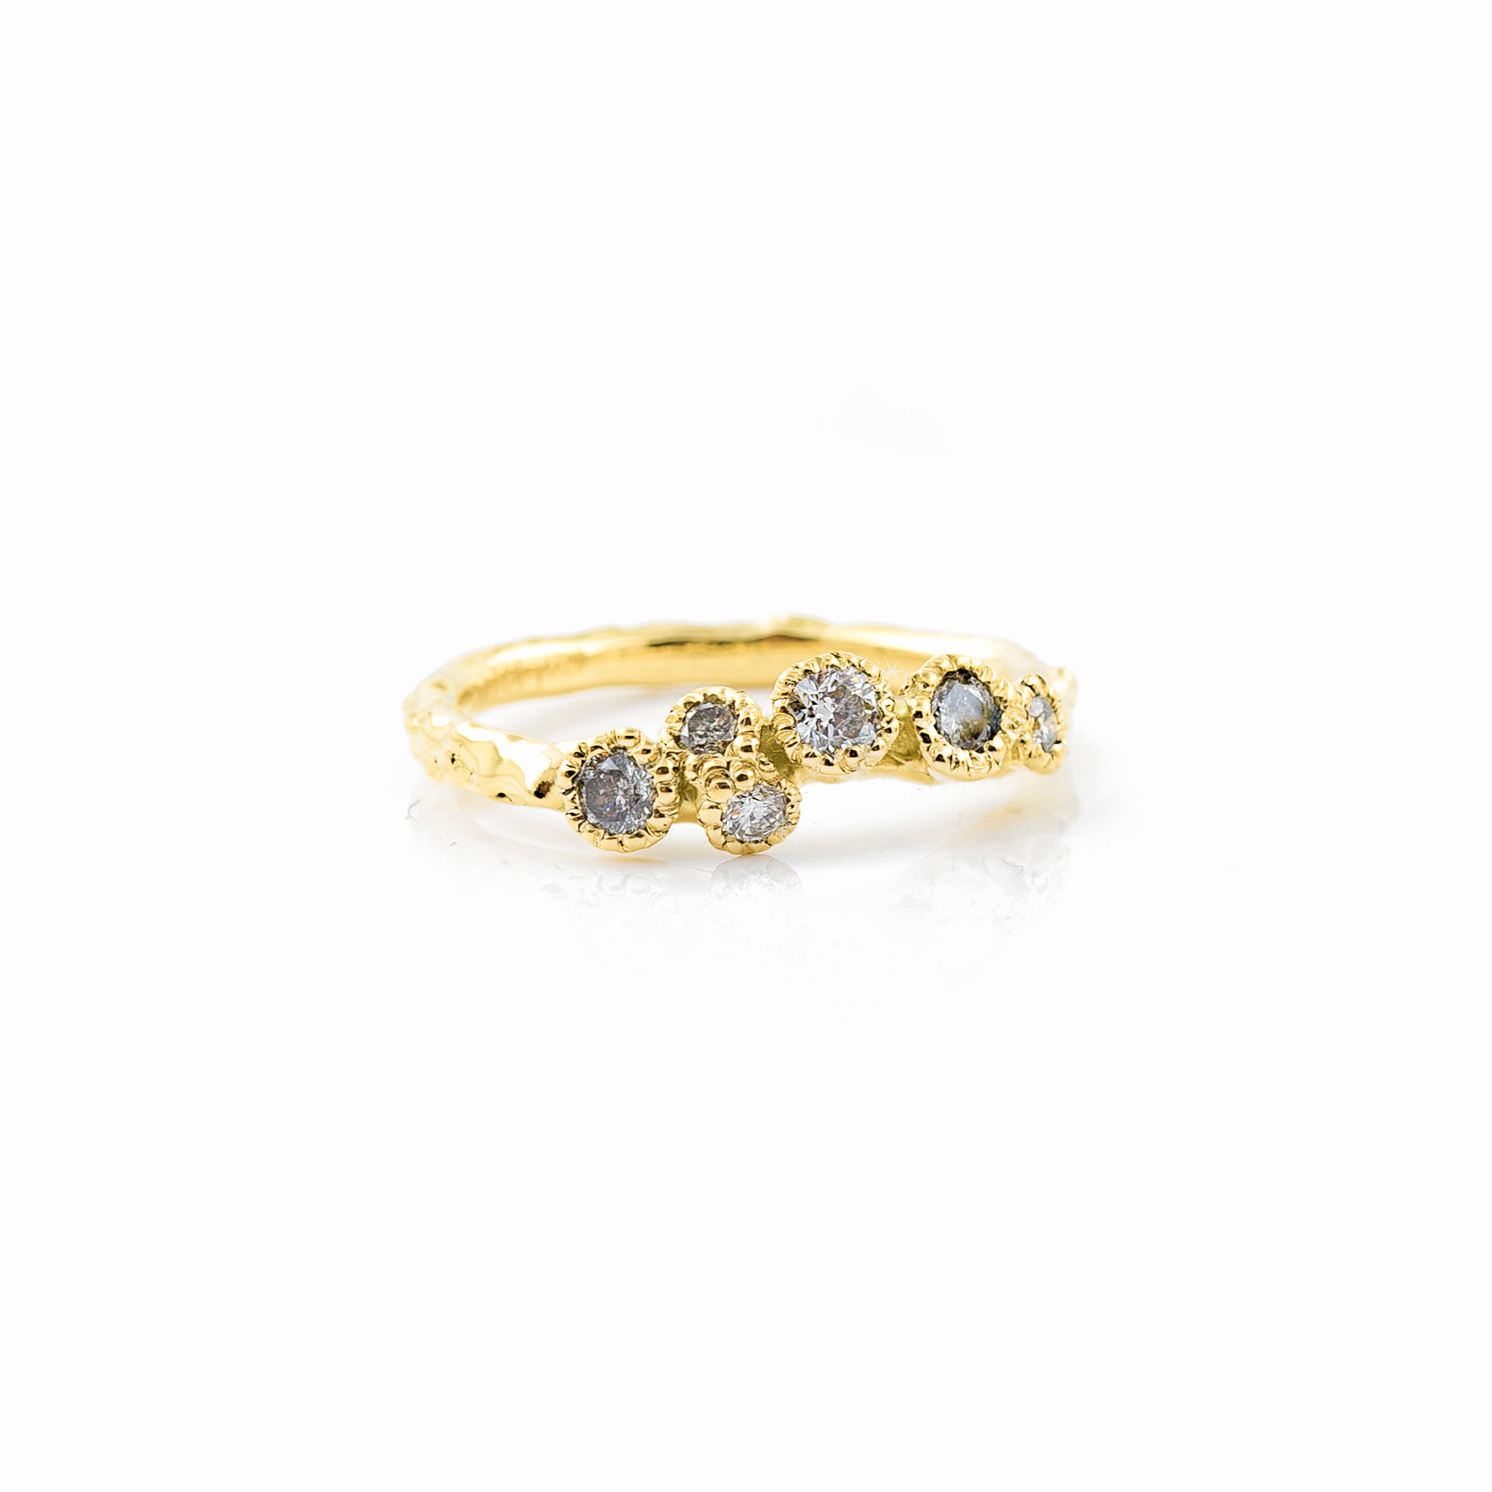 Surfacing Wedding Band   18ct yellow gold, salt and pepper diamonds, white diamonds.